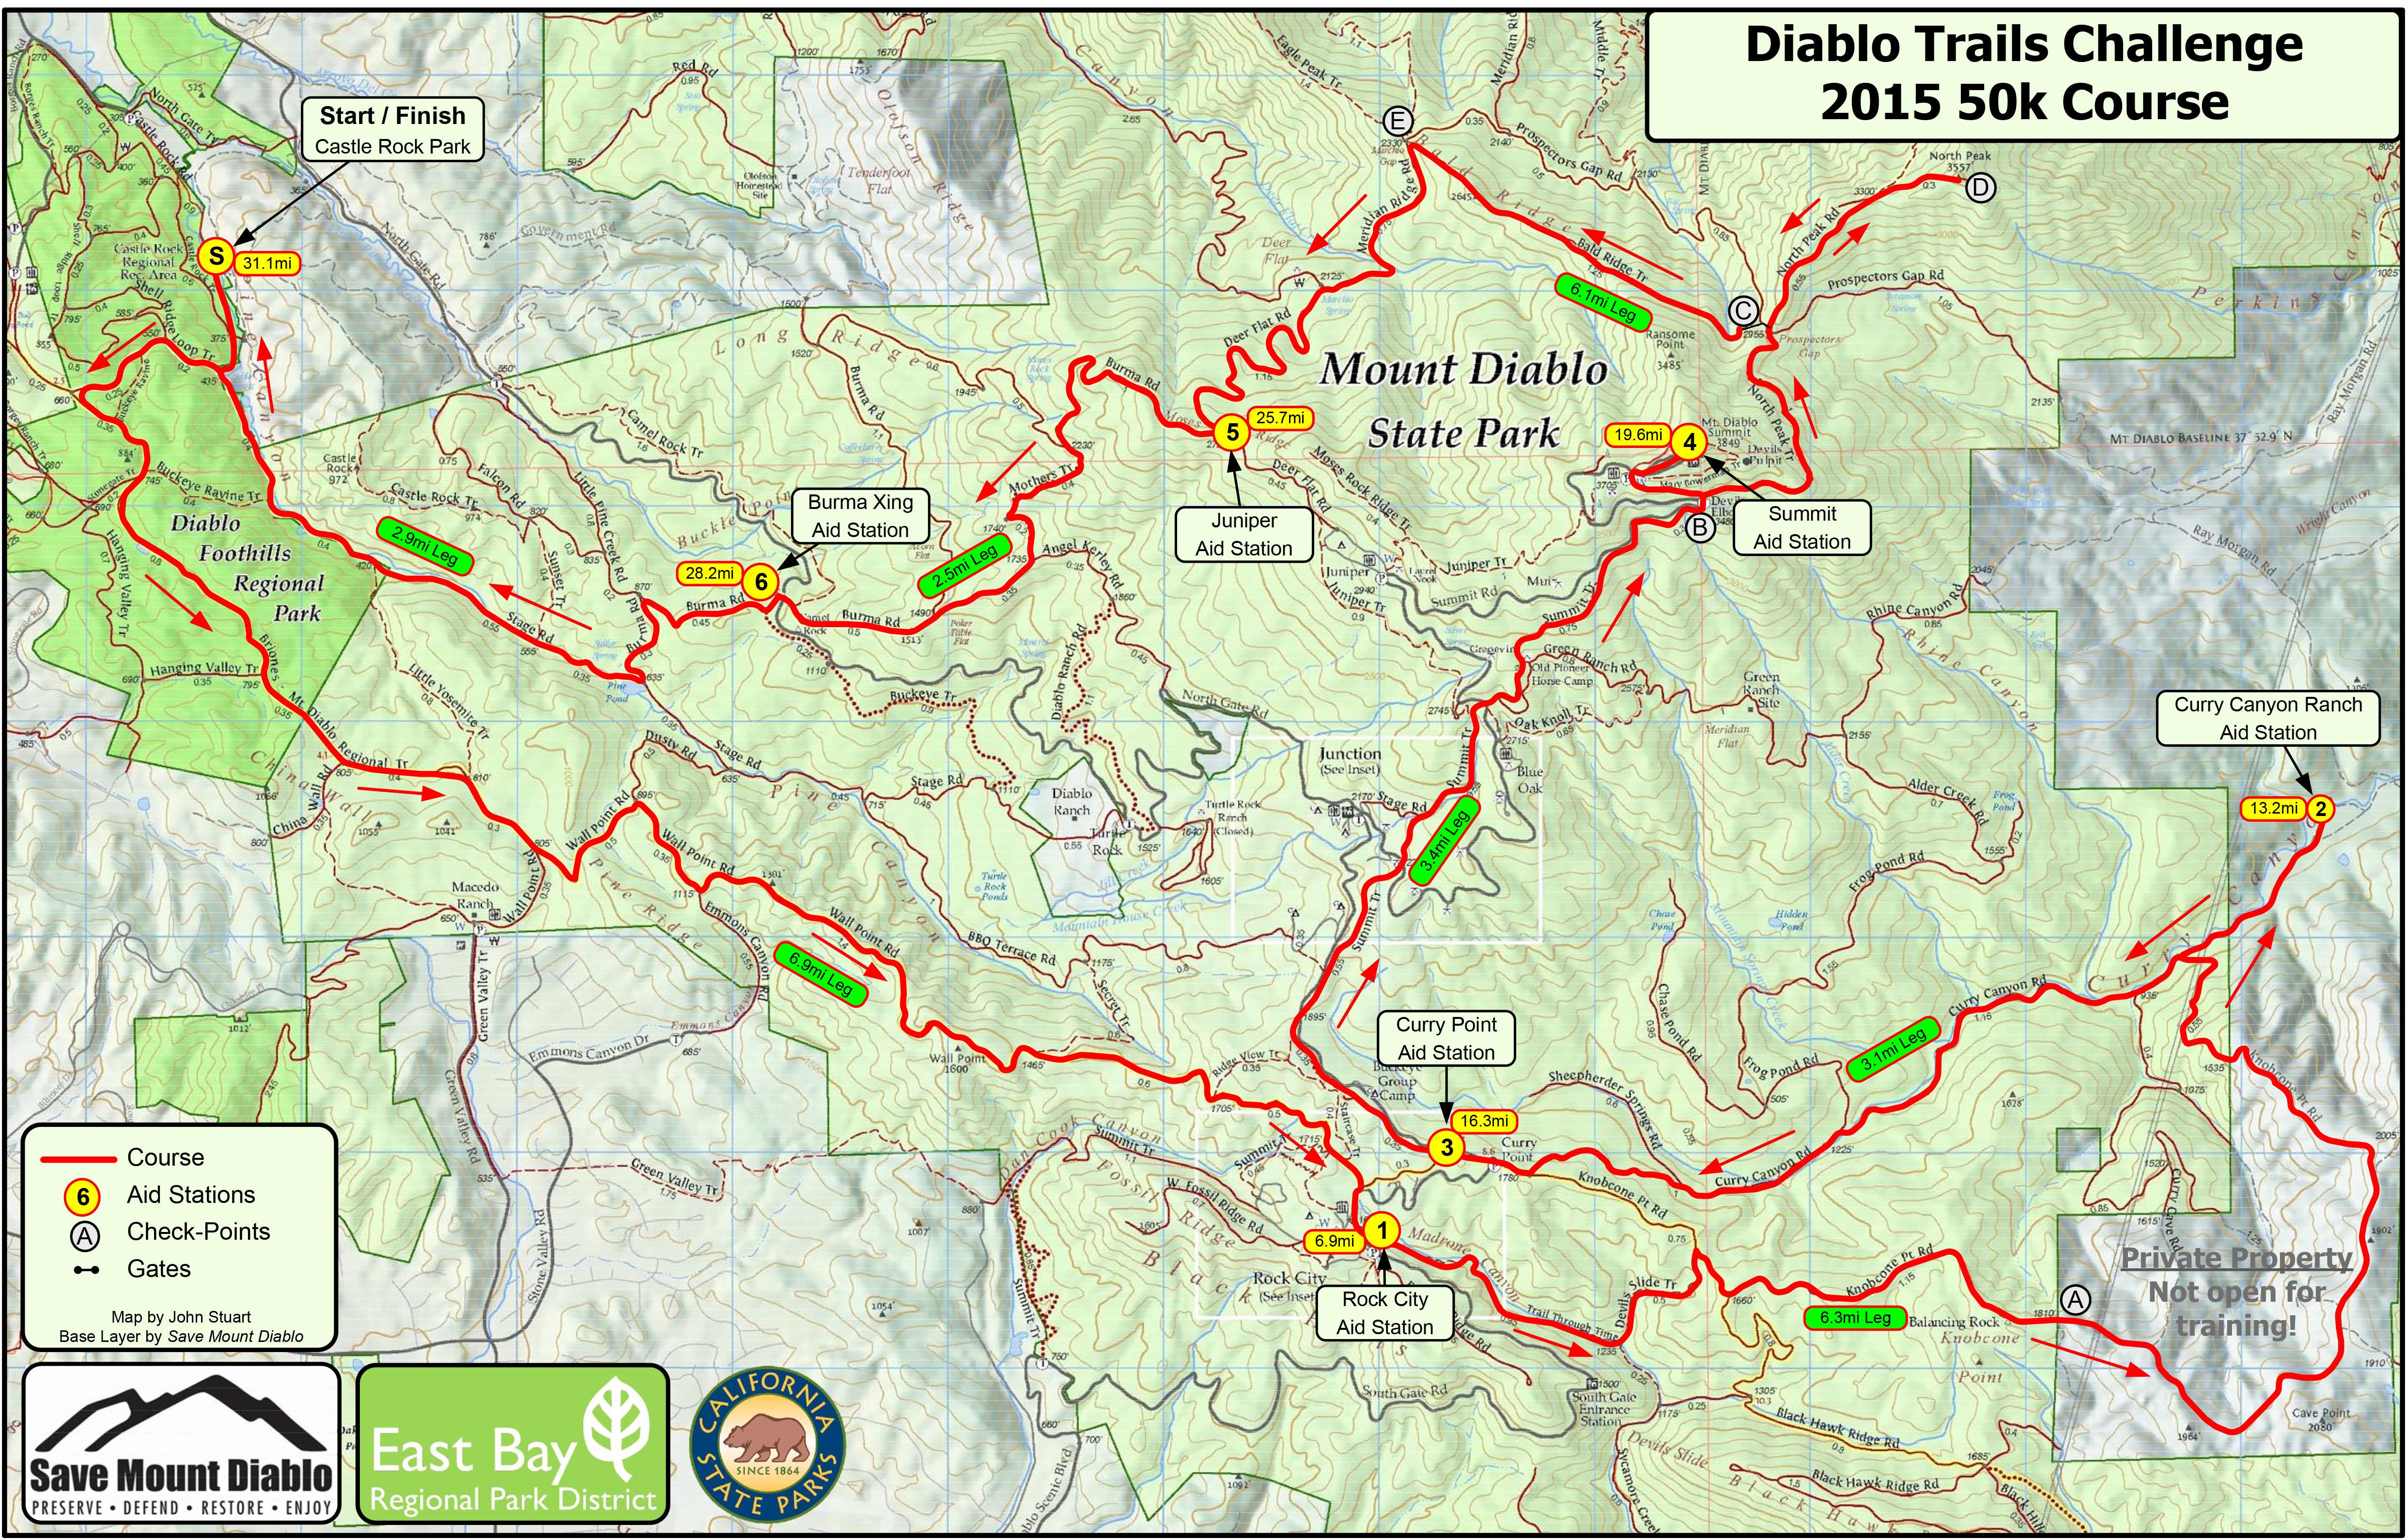 Race Info Diablo Trails Challenge - Visio continental us map